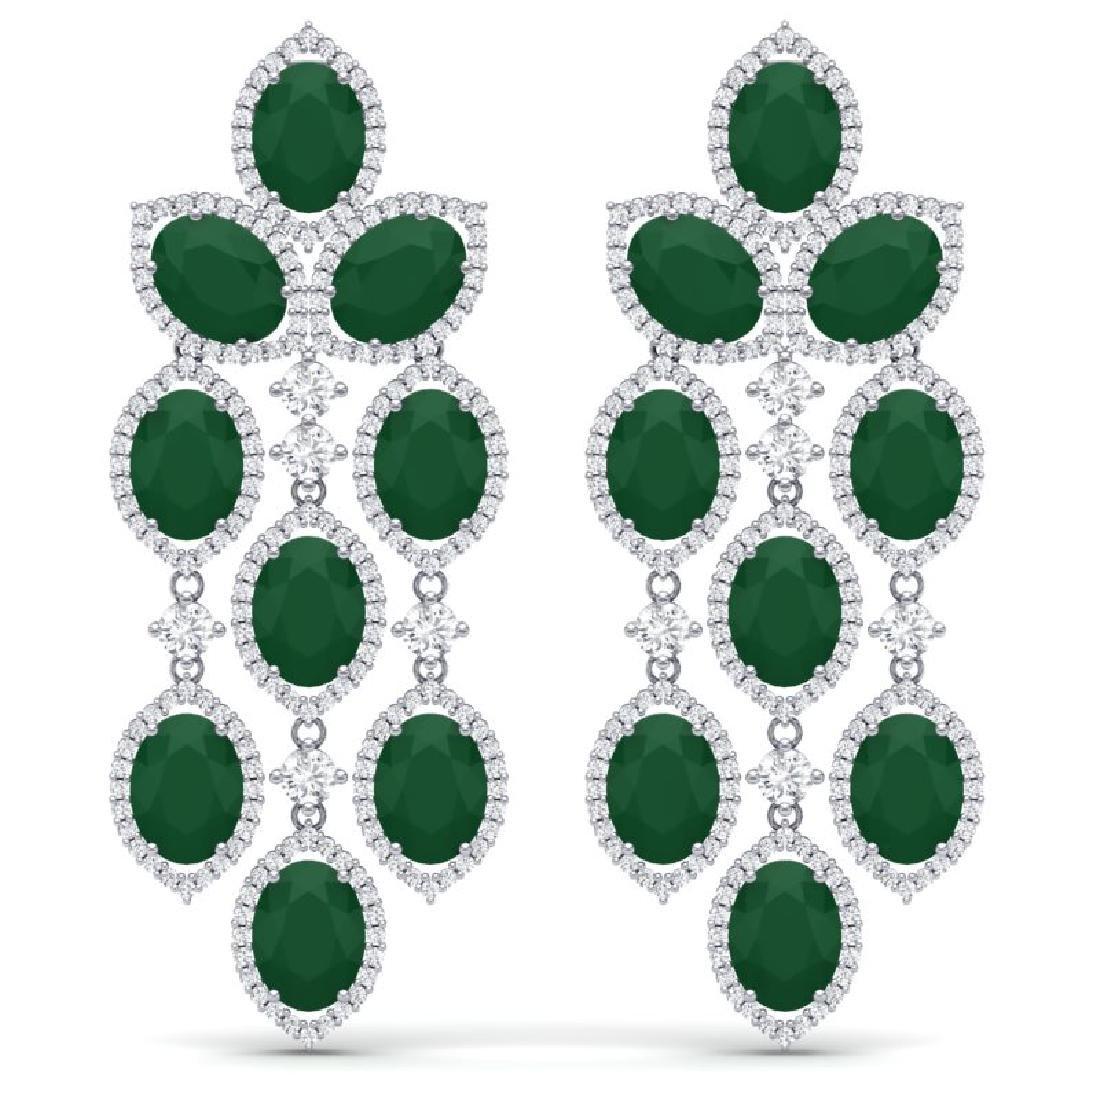 26.15 CTW Royalty Emerald & VS Diamond Earrings 18K